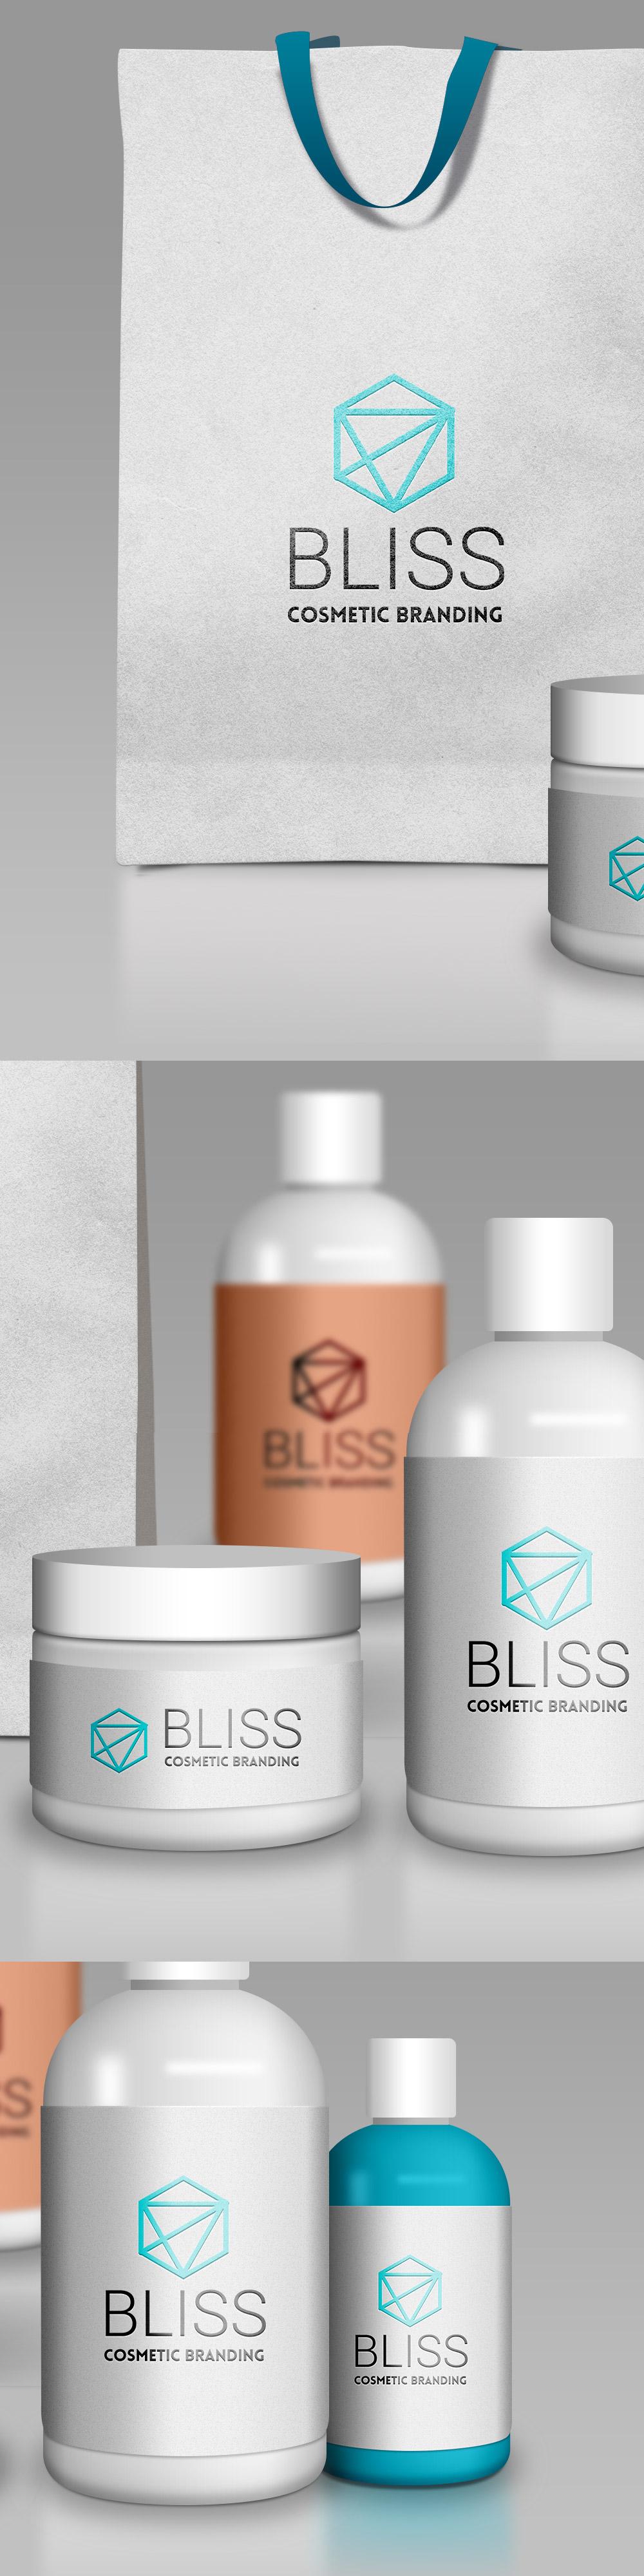 Cosmetic Branding Mockup PSD | Mockup and Free photoshop